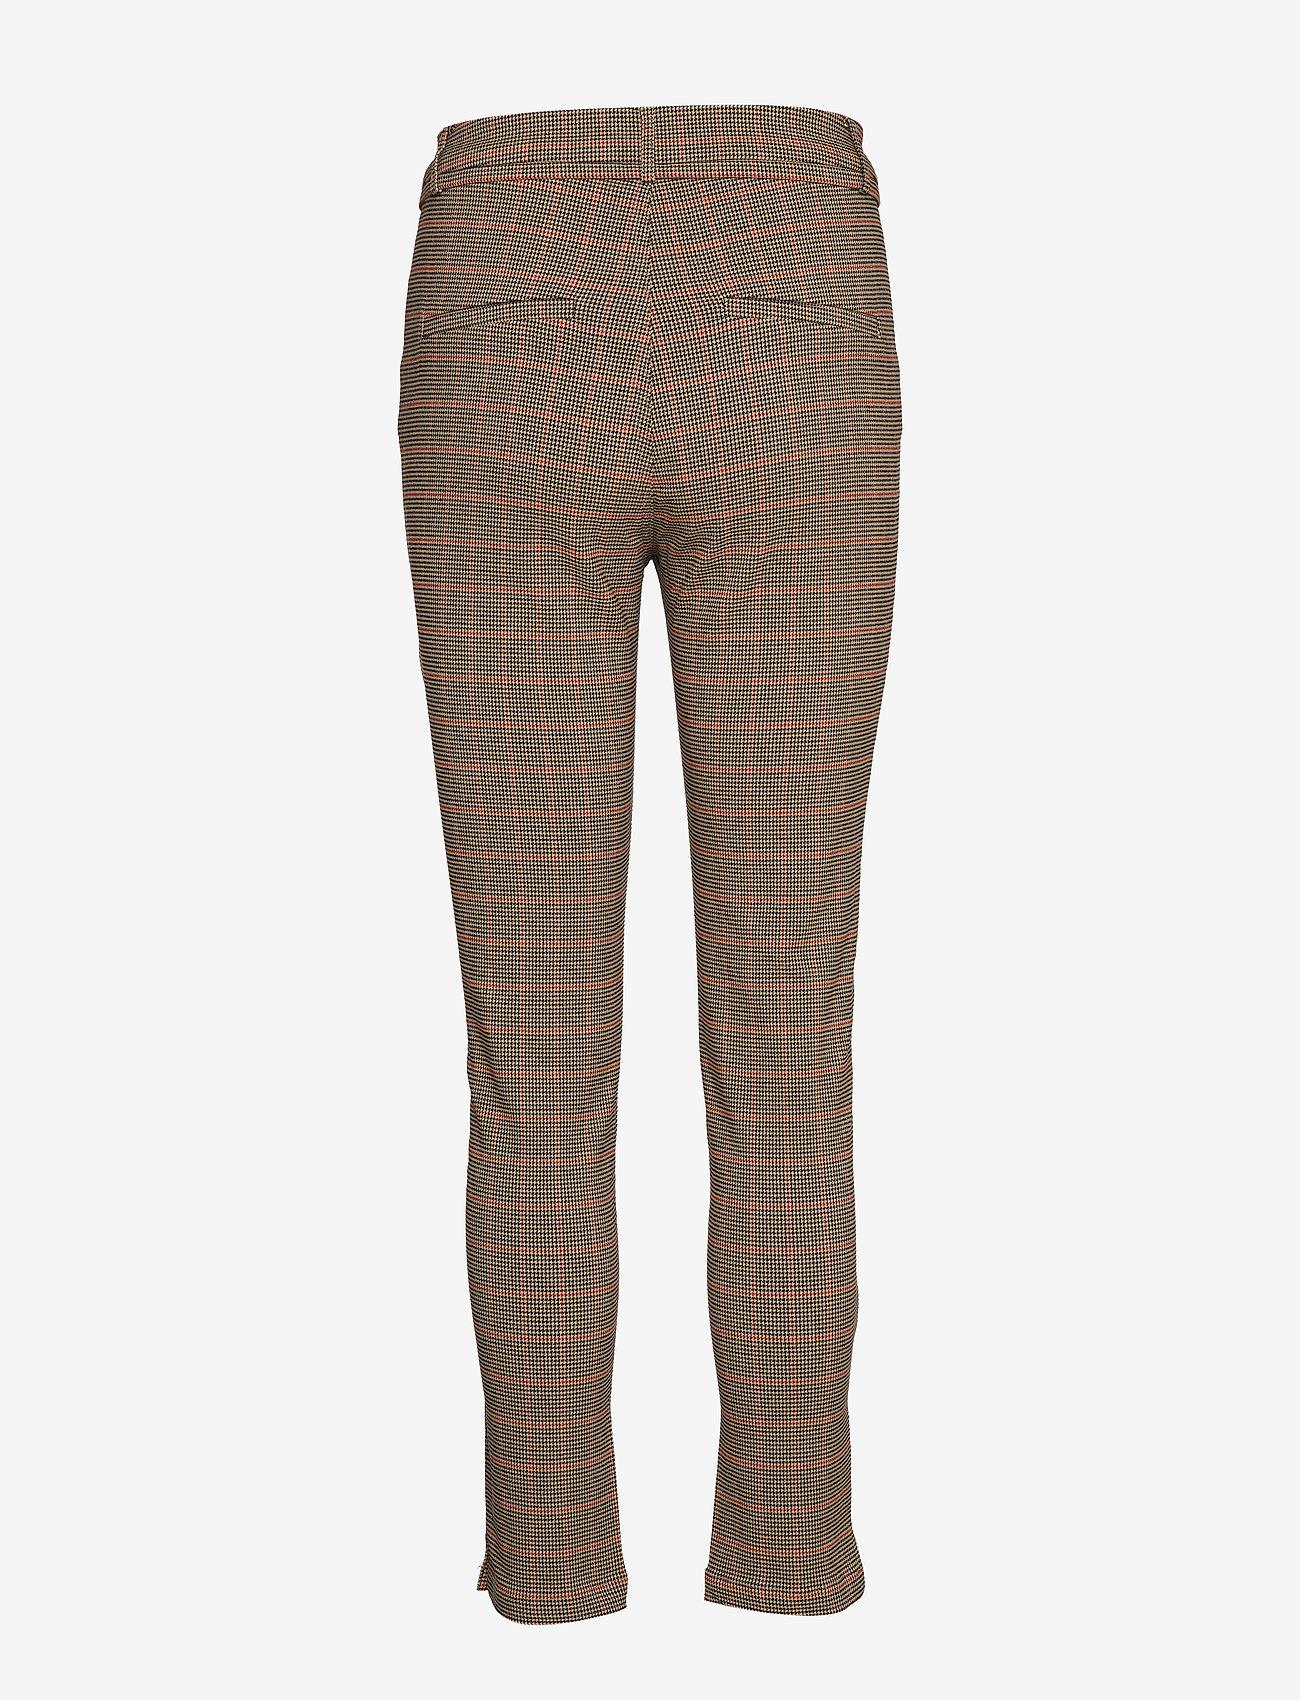 New Carma Check 7/8 Pants (Red Checked) (59.97 €) - Minus UvJGC8Bu